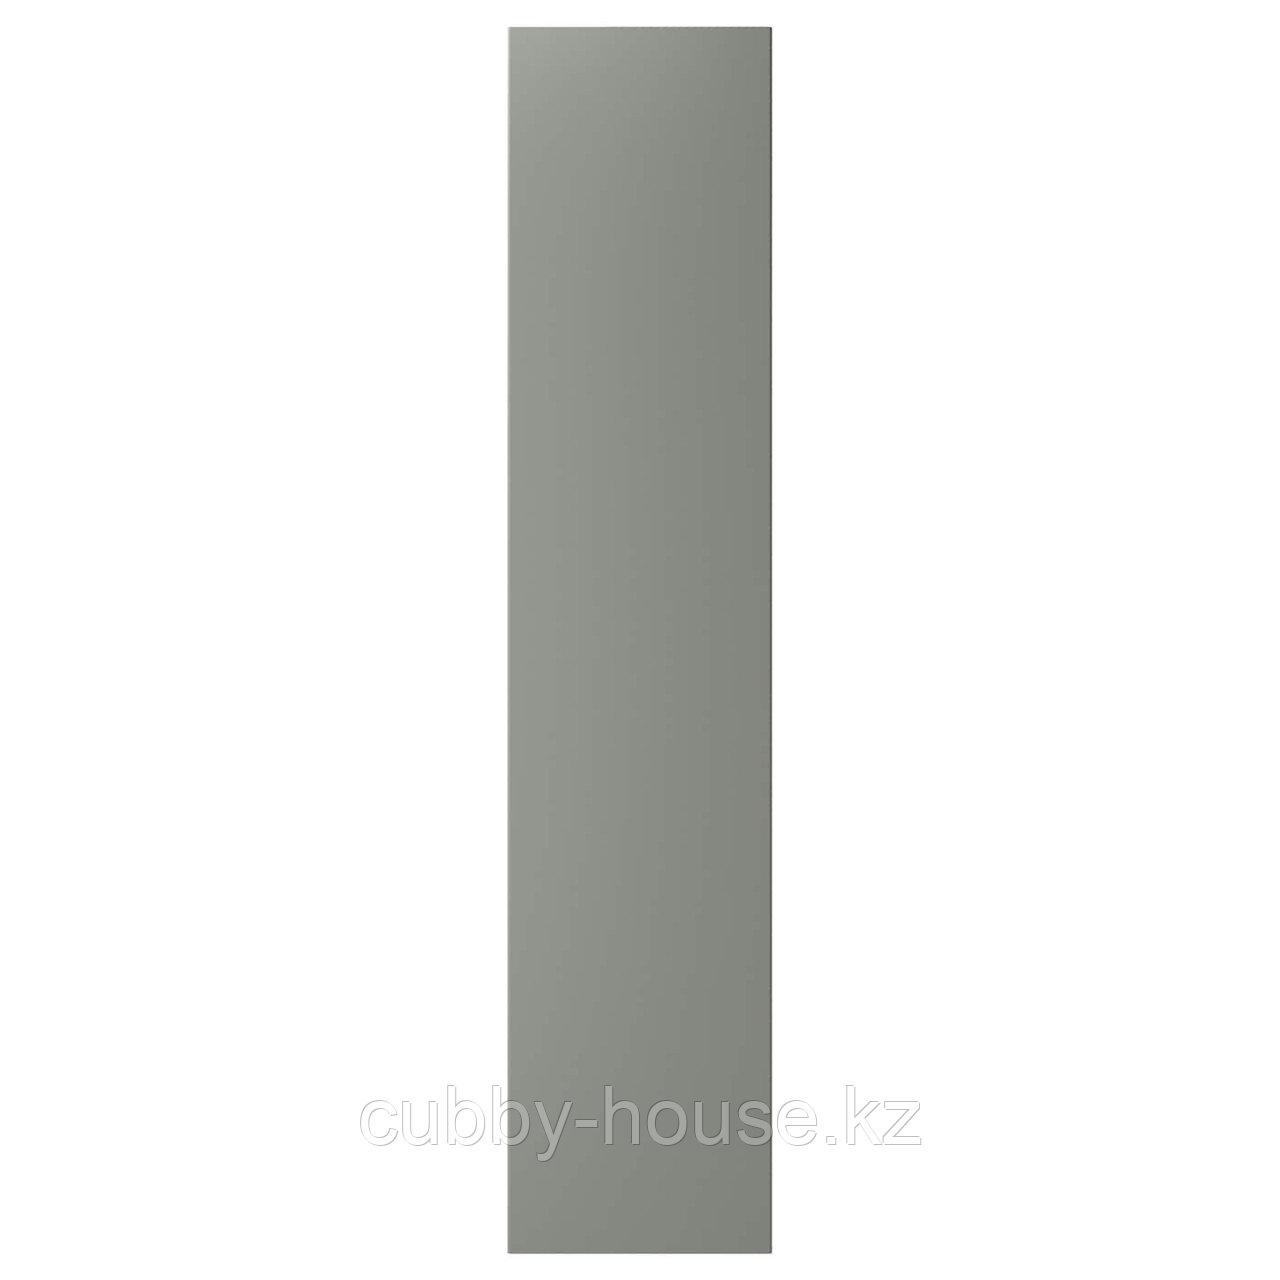 РЕИНСВОЛЛ Дверца с петлями, серо-зеленый, 50x229 см